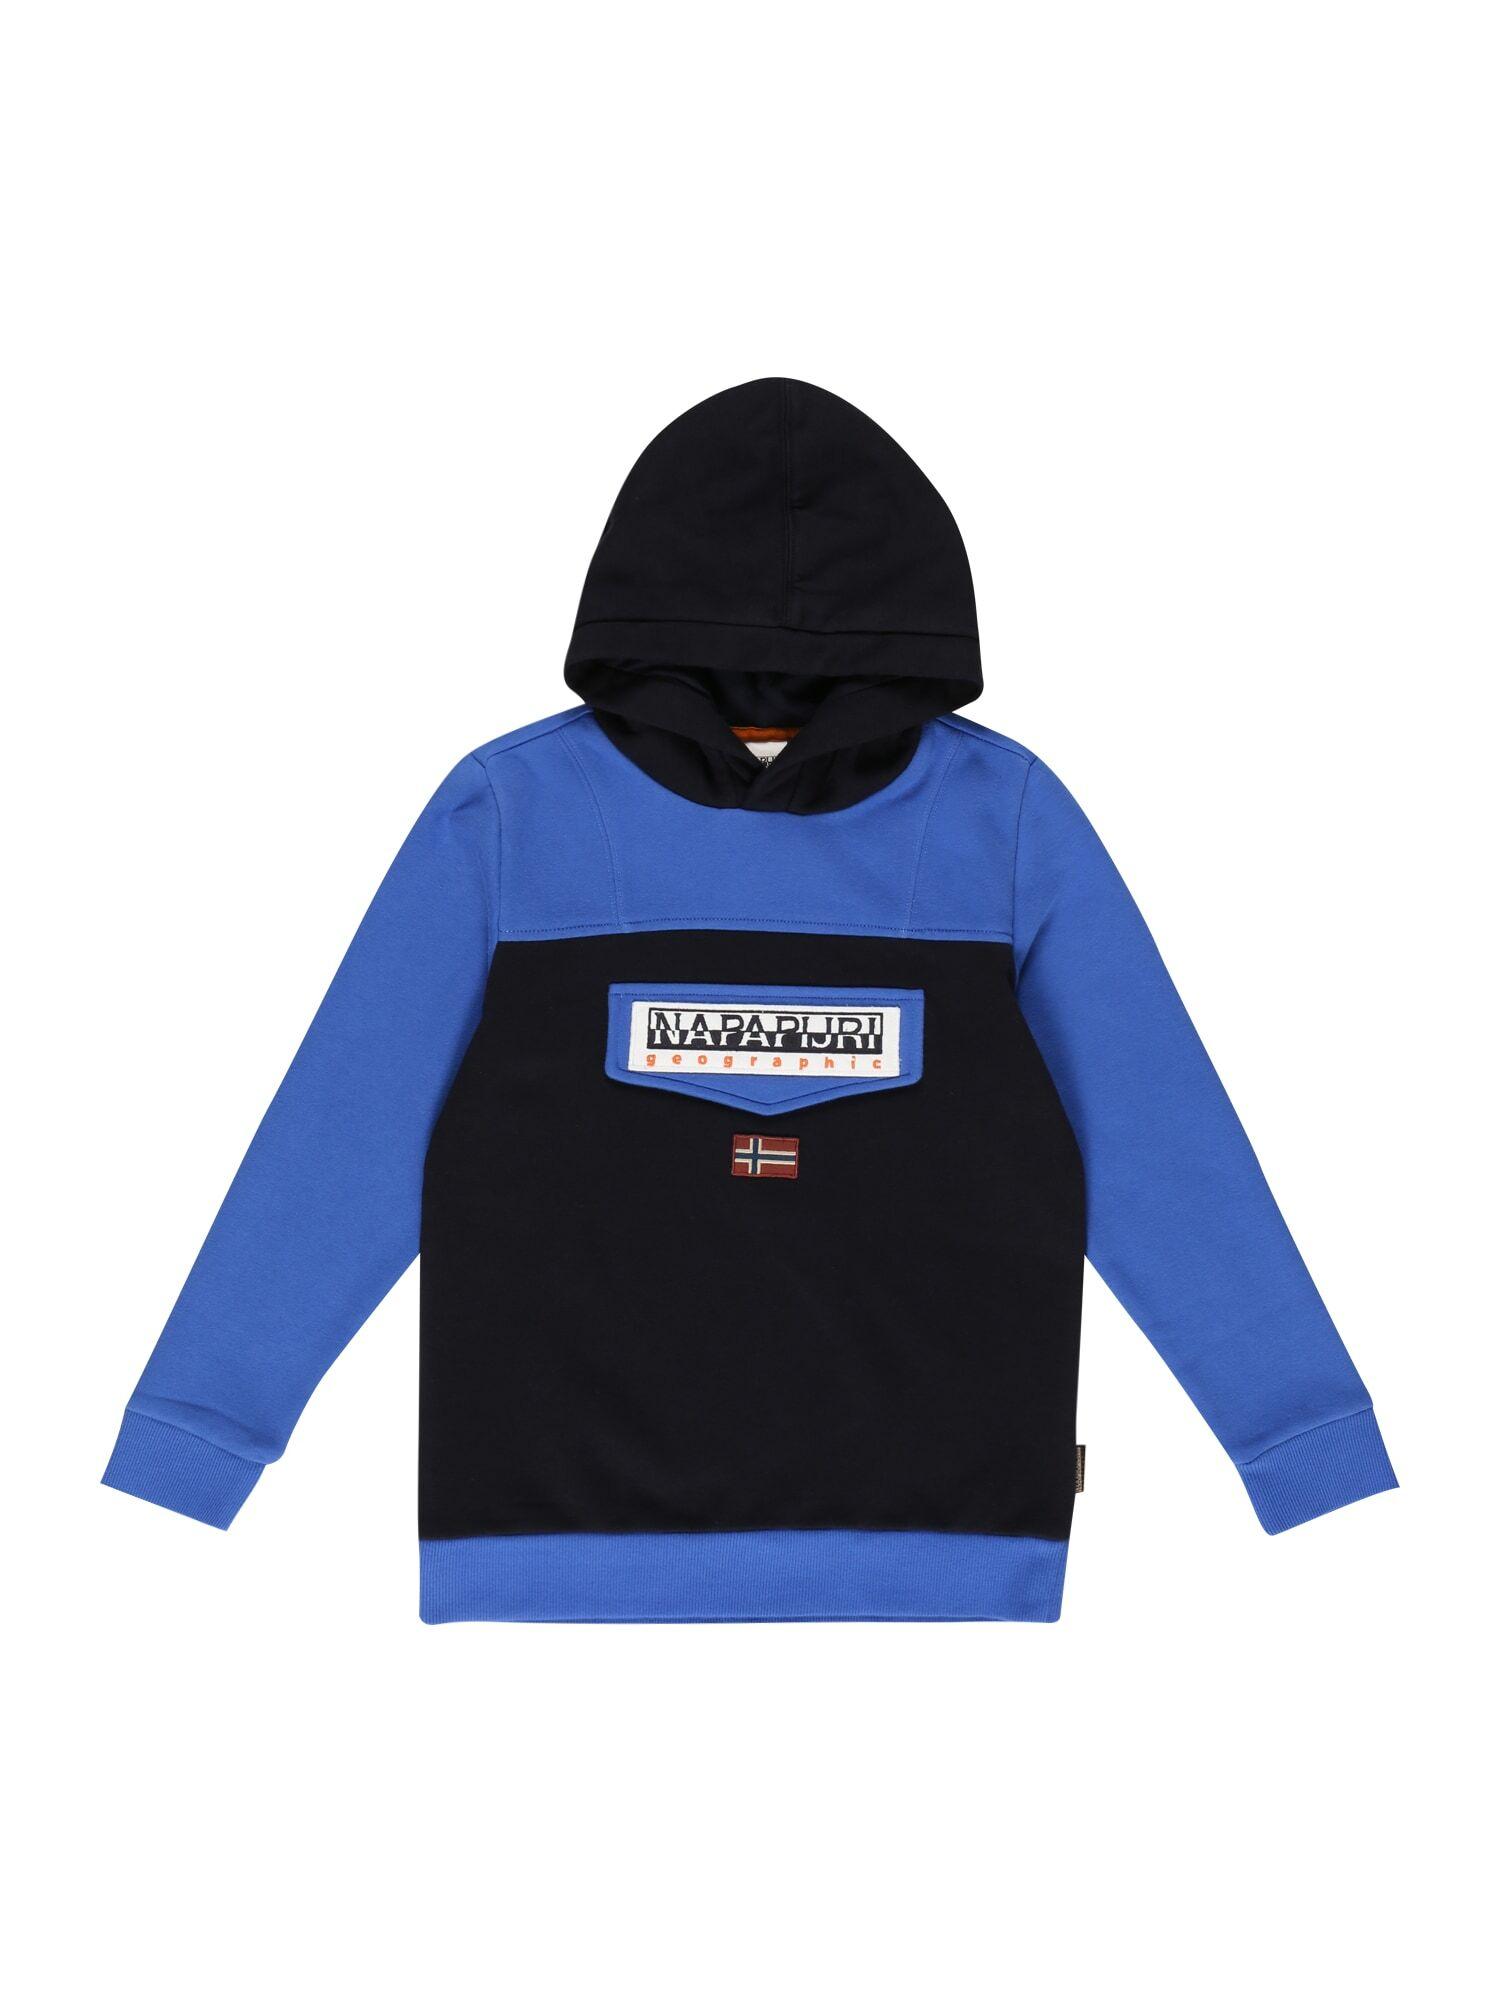 NAPAPIJRI Sweat-shirt 'BURGEE'  - Bleu - Taille: 10 - girl